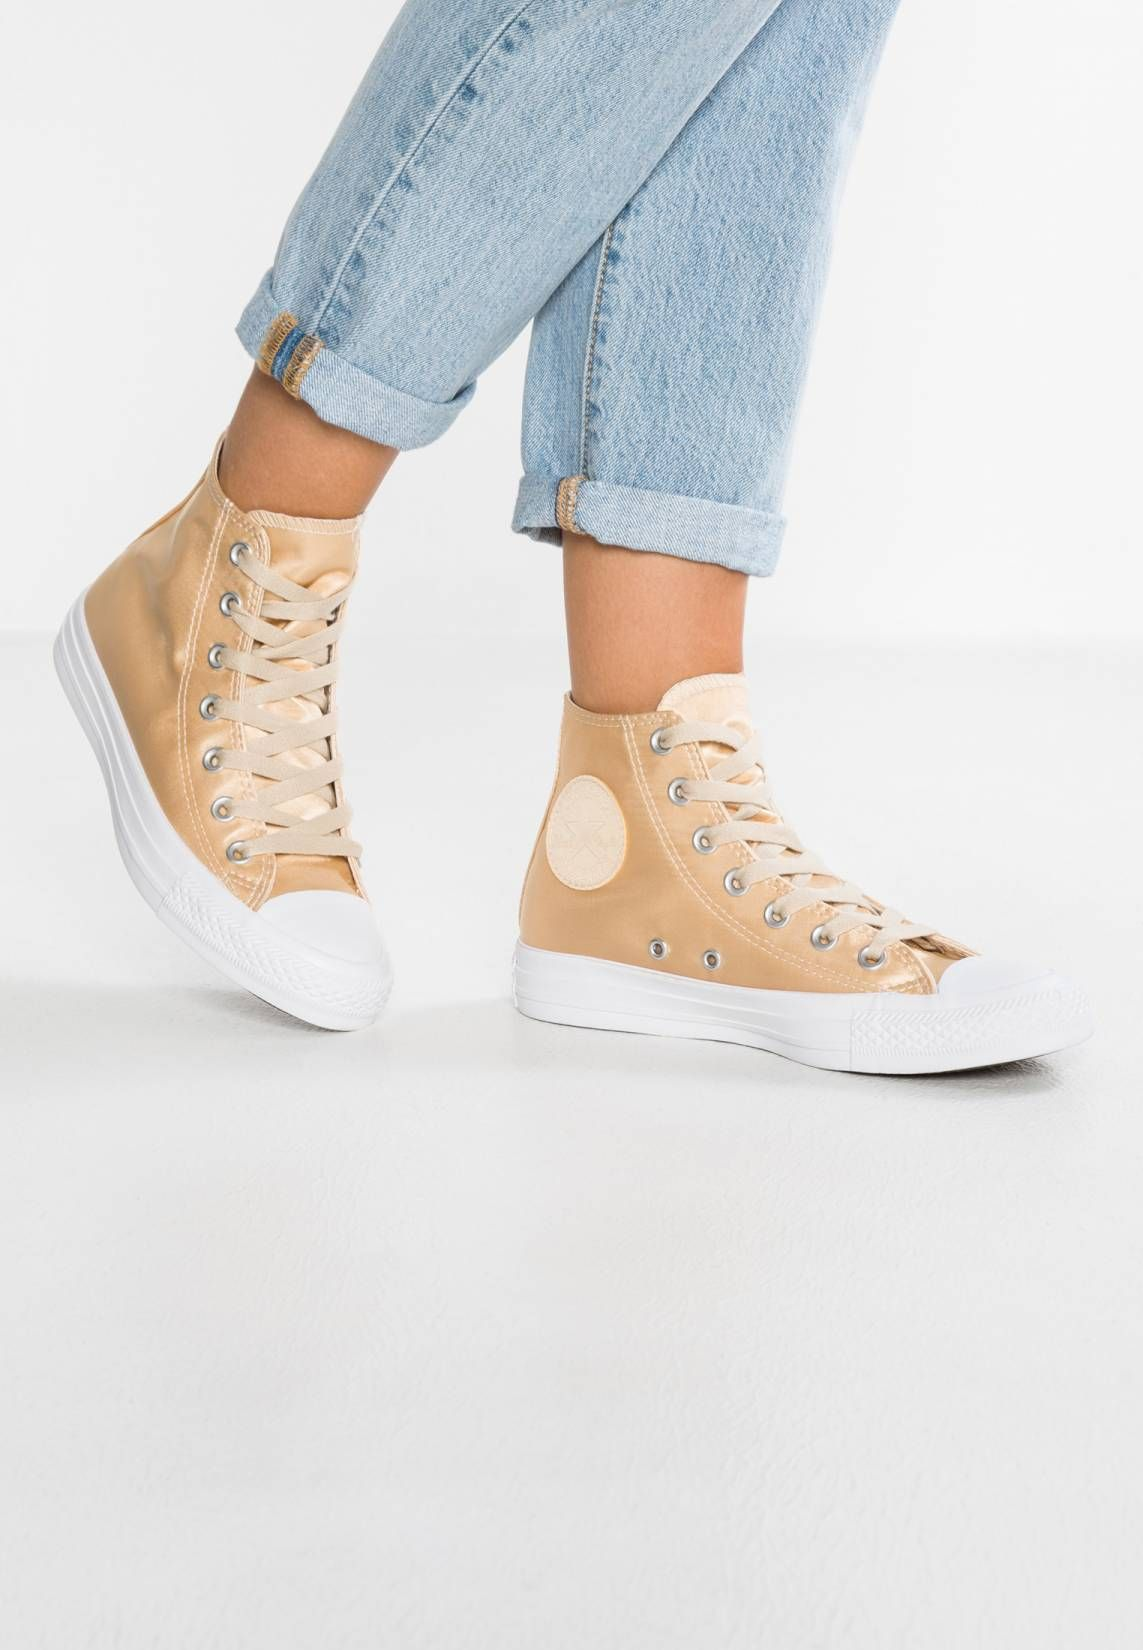 3ea561961f46e Converse. CHUCK TAYLOR ALL STAR - Zapatillas altas - parchment white.  Suela fibra sintética. Forma del tacón plano. Plantilla tela.  Puntera redonda.